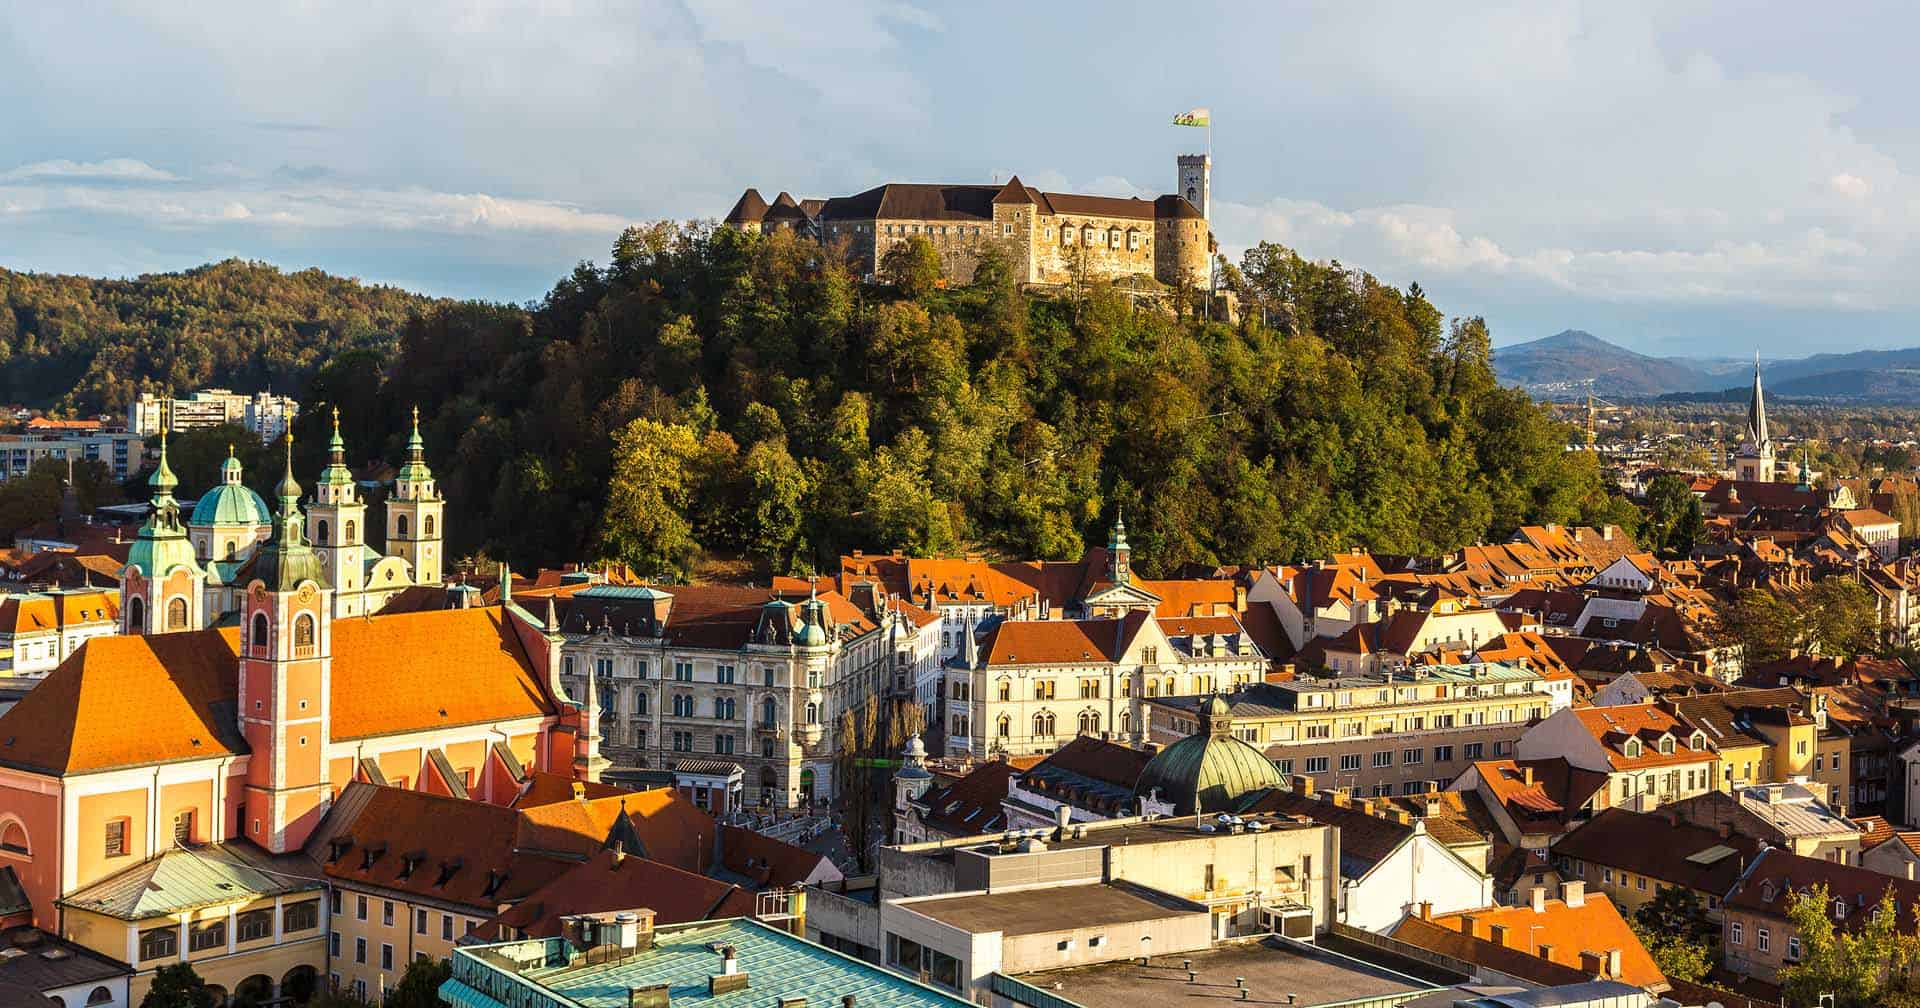 top tourist attractions in ljubljana slovenia featured